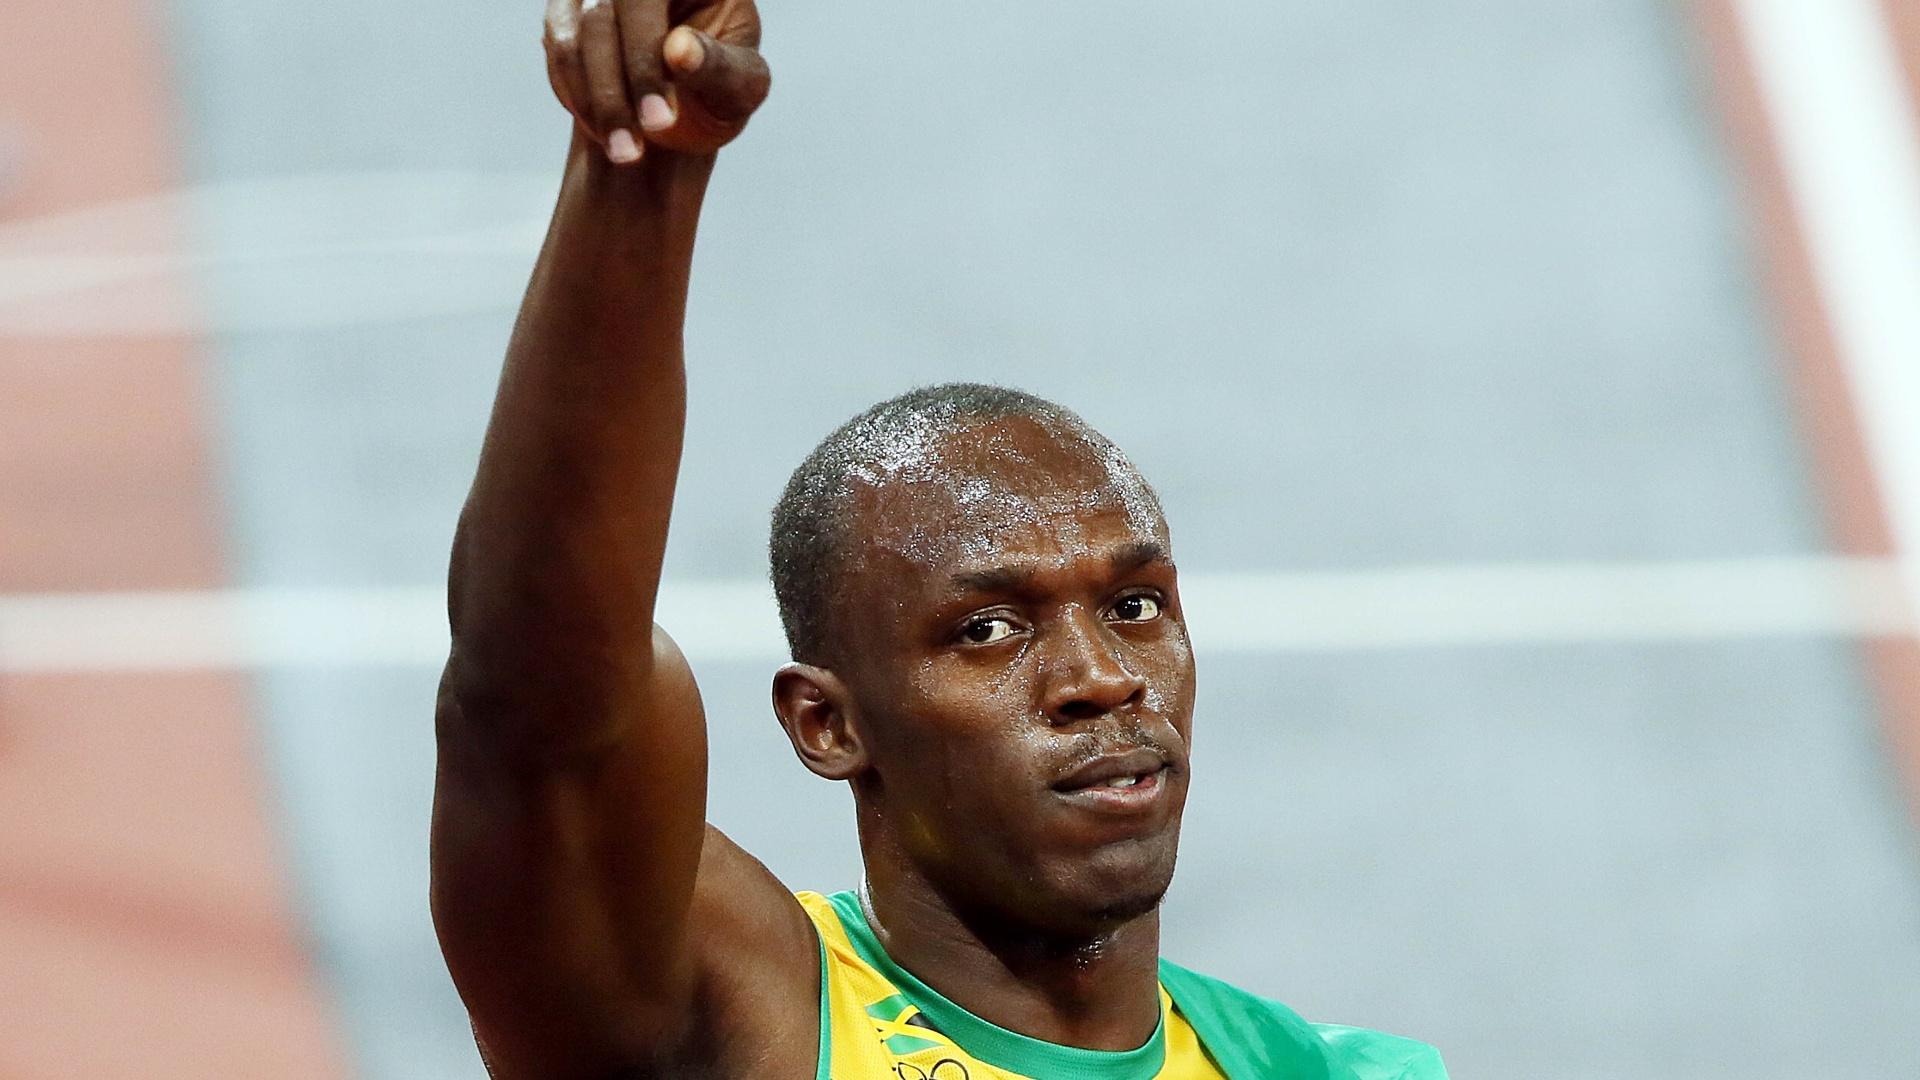 Usain Bolt celebra vitória na final olímpica dos 100 m rasos